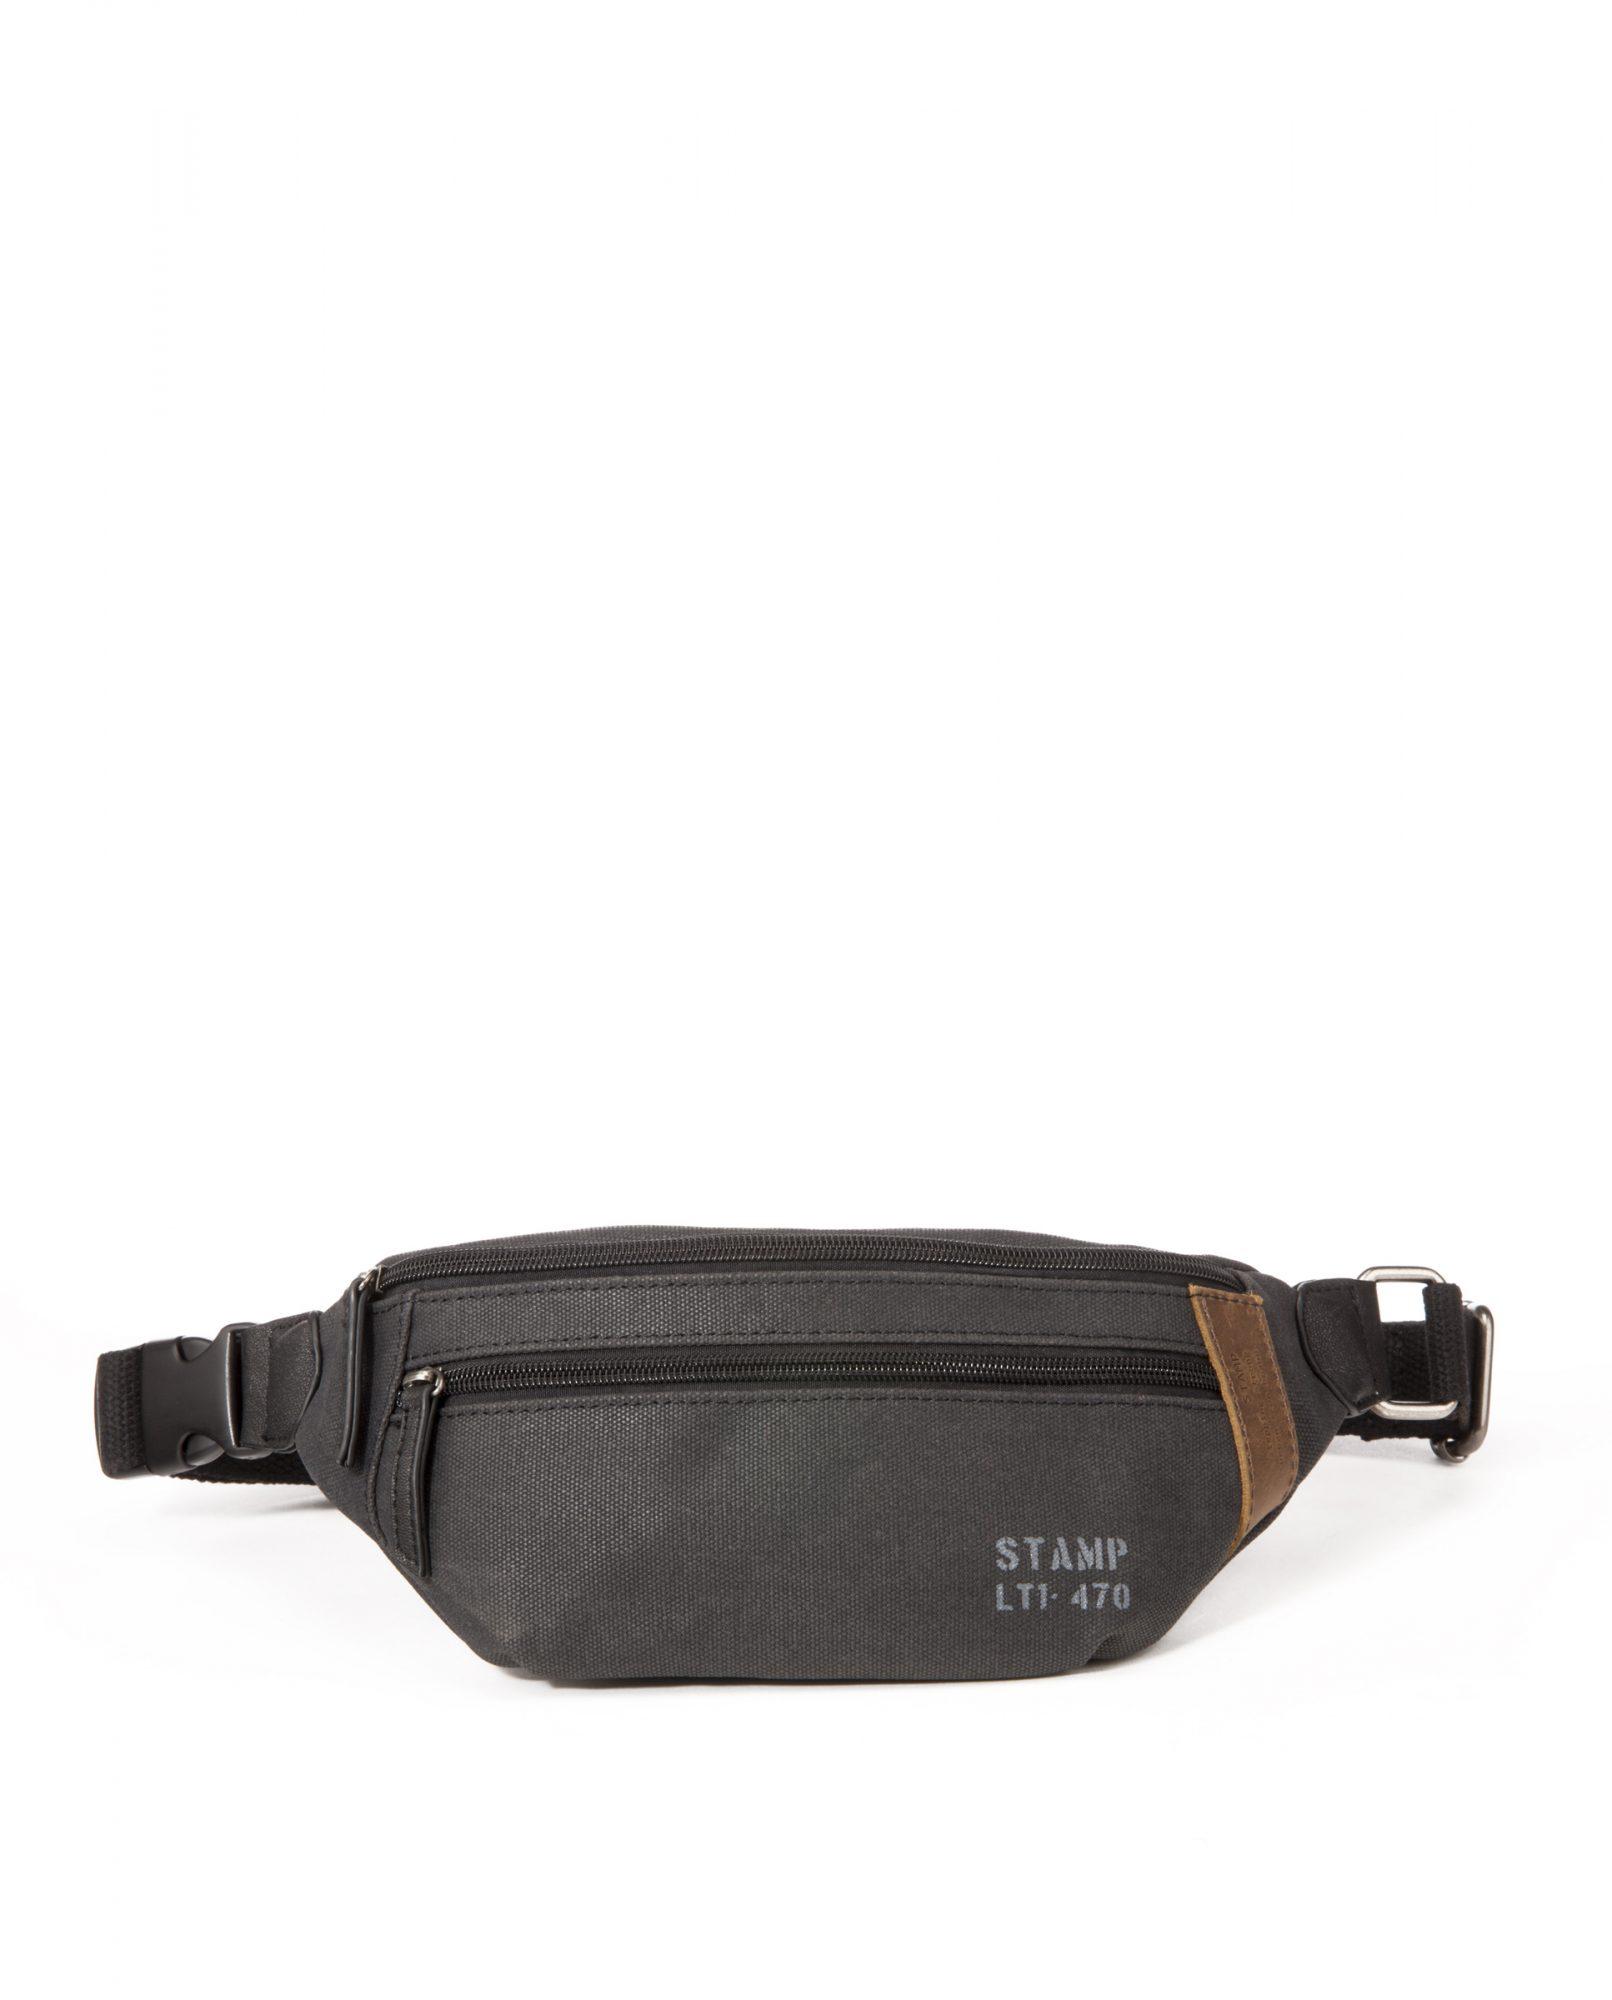 DRACO-Riñonera de hombre Stamp en lona color negro-BHST04730NE-STAMP